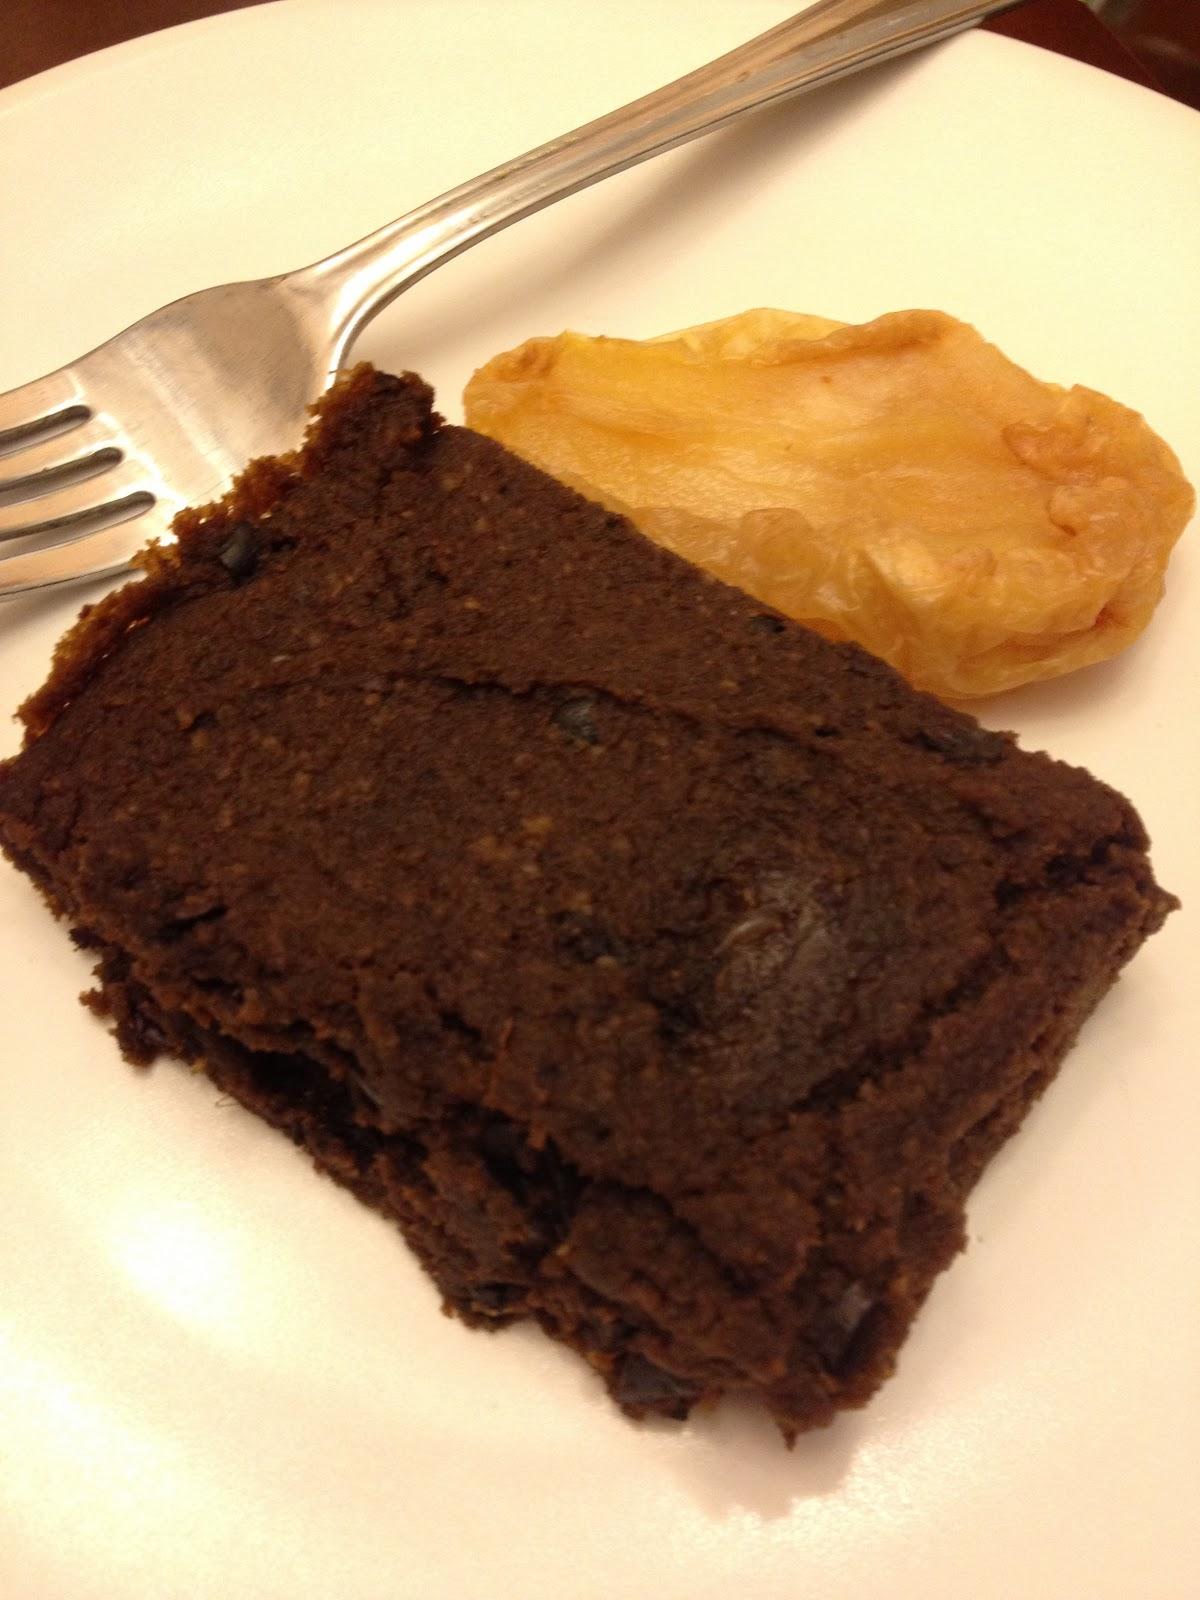 Feeding Ger Sasser: Paleo Cocoa Nib Cake